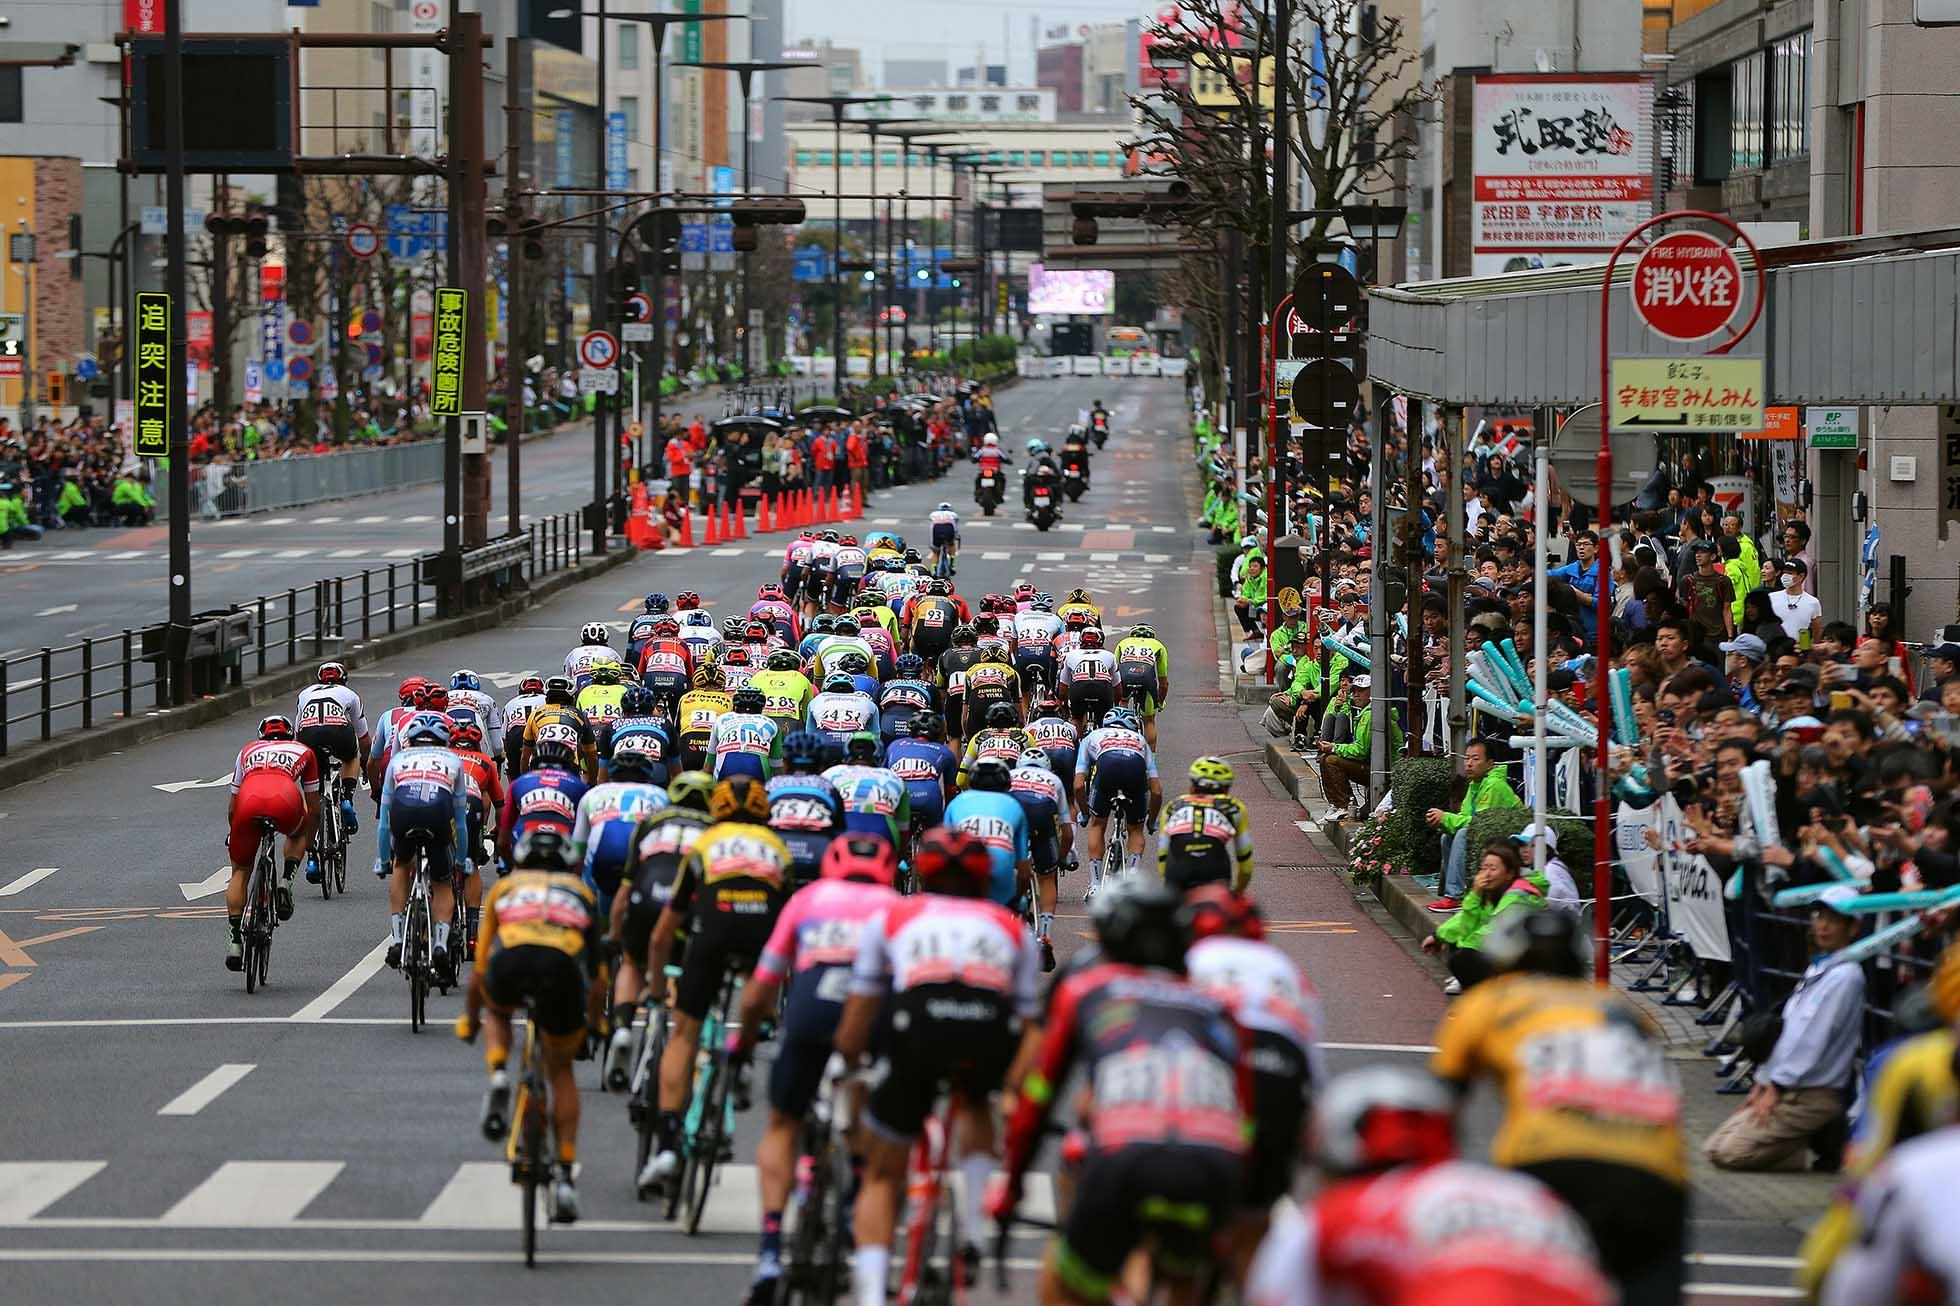 UTSUNOMIYA, JAPAN - OCTOBER 19: Utsunomiya City / Peloton / Fans / Public / Landscape / during the 28th Japan Cup 2019 - Criterium a 38,2km race from Utsunomiya to Utsunomiya / @Japancup_ofc / on October 19, 2019 in Utsunomiya, Japan. (Photo by Kei Tsuji/Getty Images)